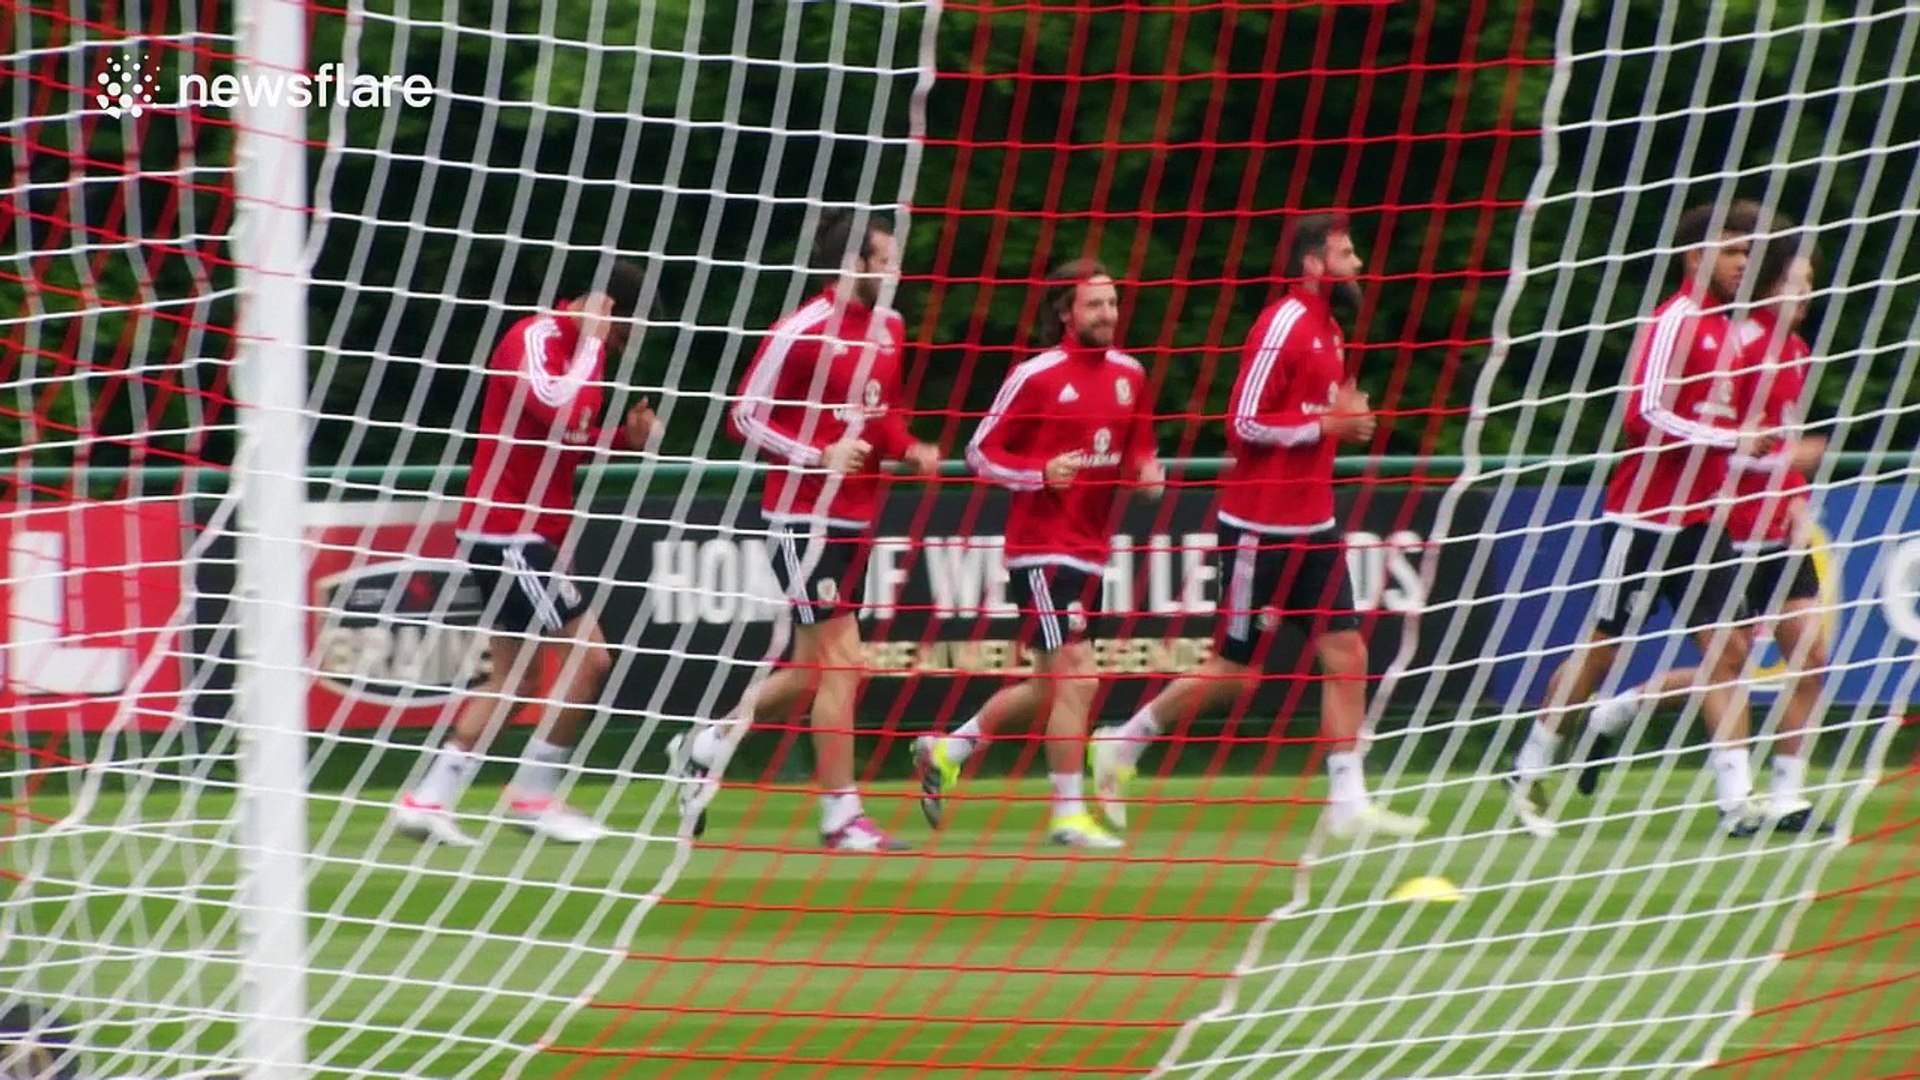 Wales football team, including Gareth Bale, train ahead of Euro 2016